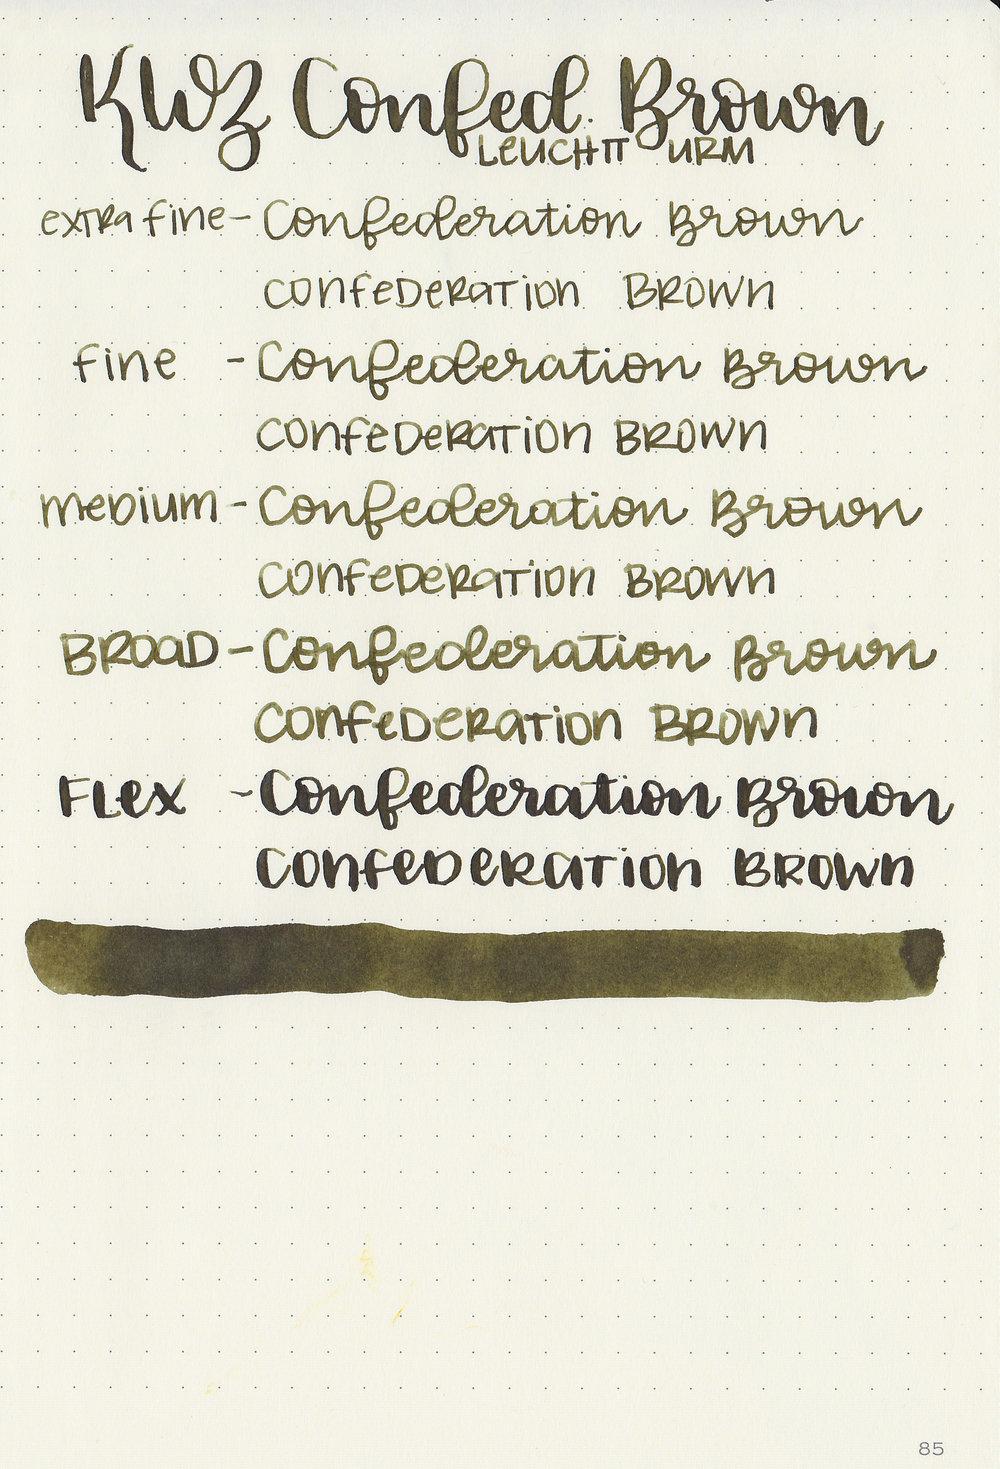 kwz-confederation-brown-8.jpg